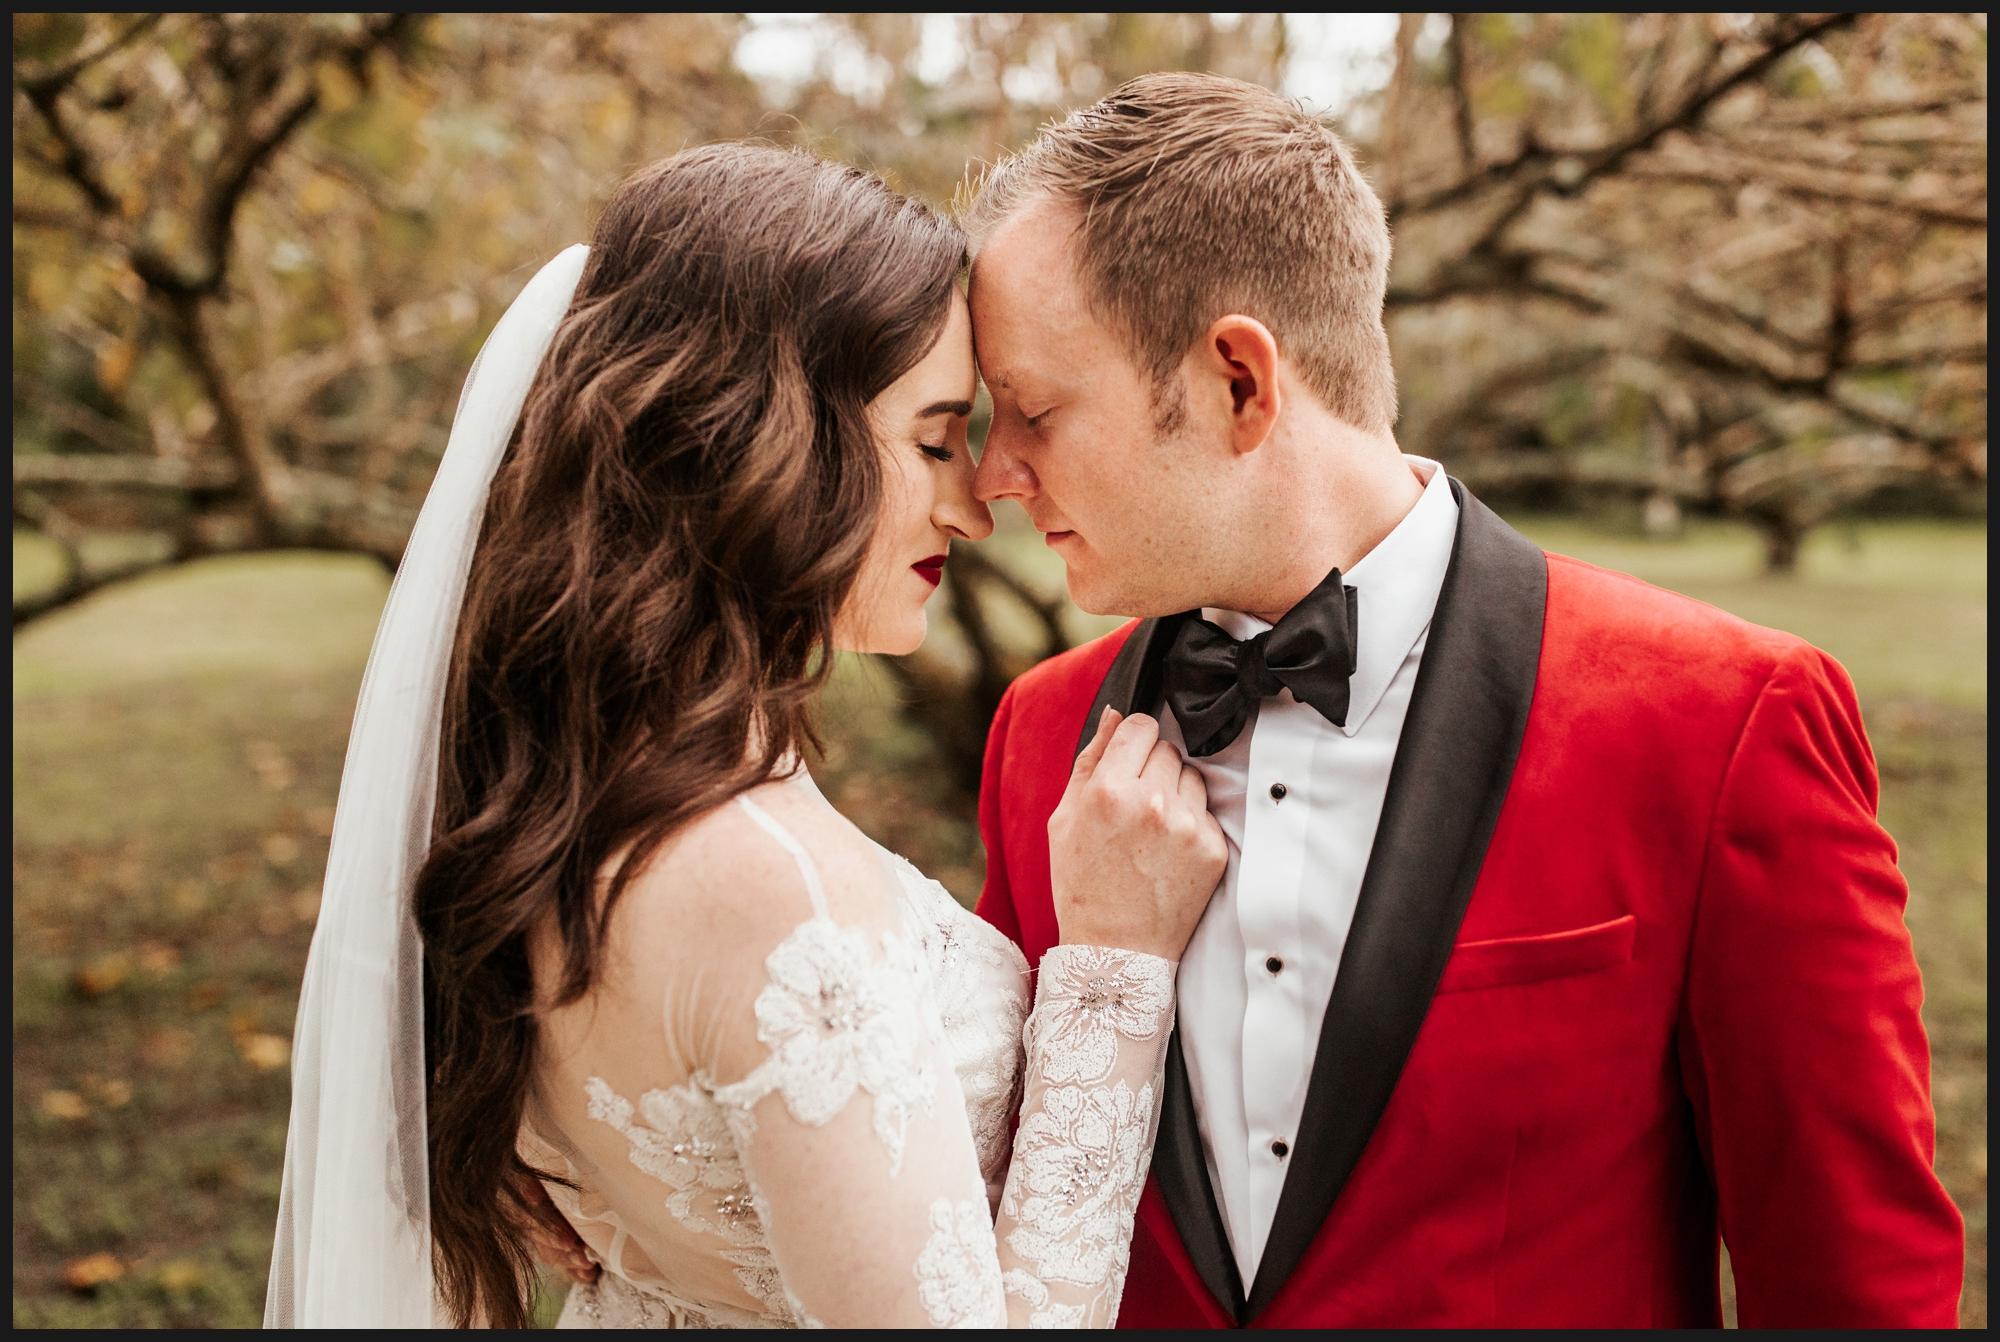 Orlando-Wedding-Photographer-destination-wedding-photographer-florida-wedding-photographer-hawaii-wedding-photographer_0530.jpg